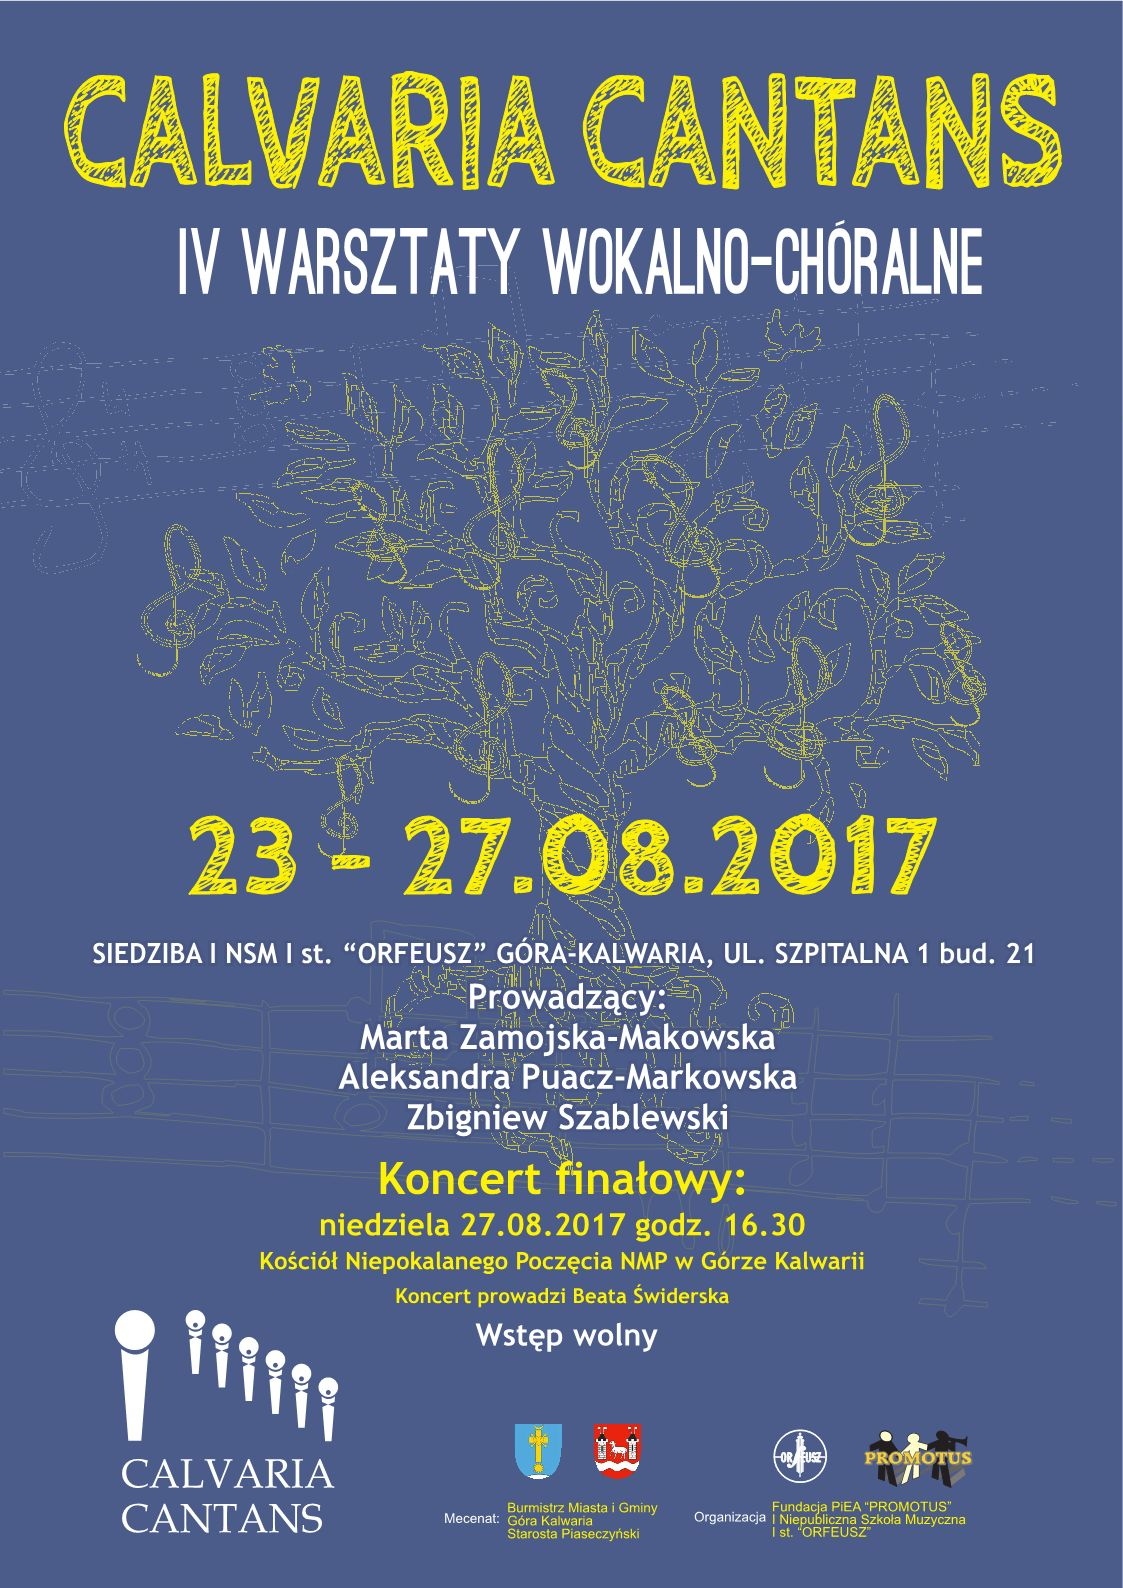 "IV Warsztaty Wokalno-Chóralne ""CALVARIA CANTANS"""